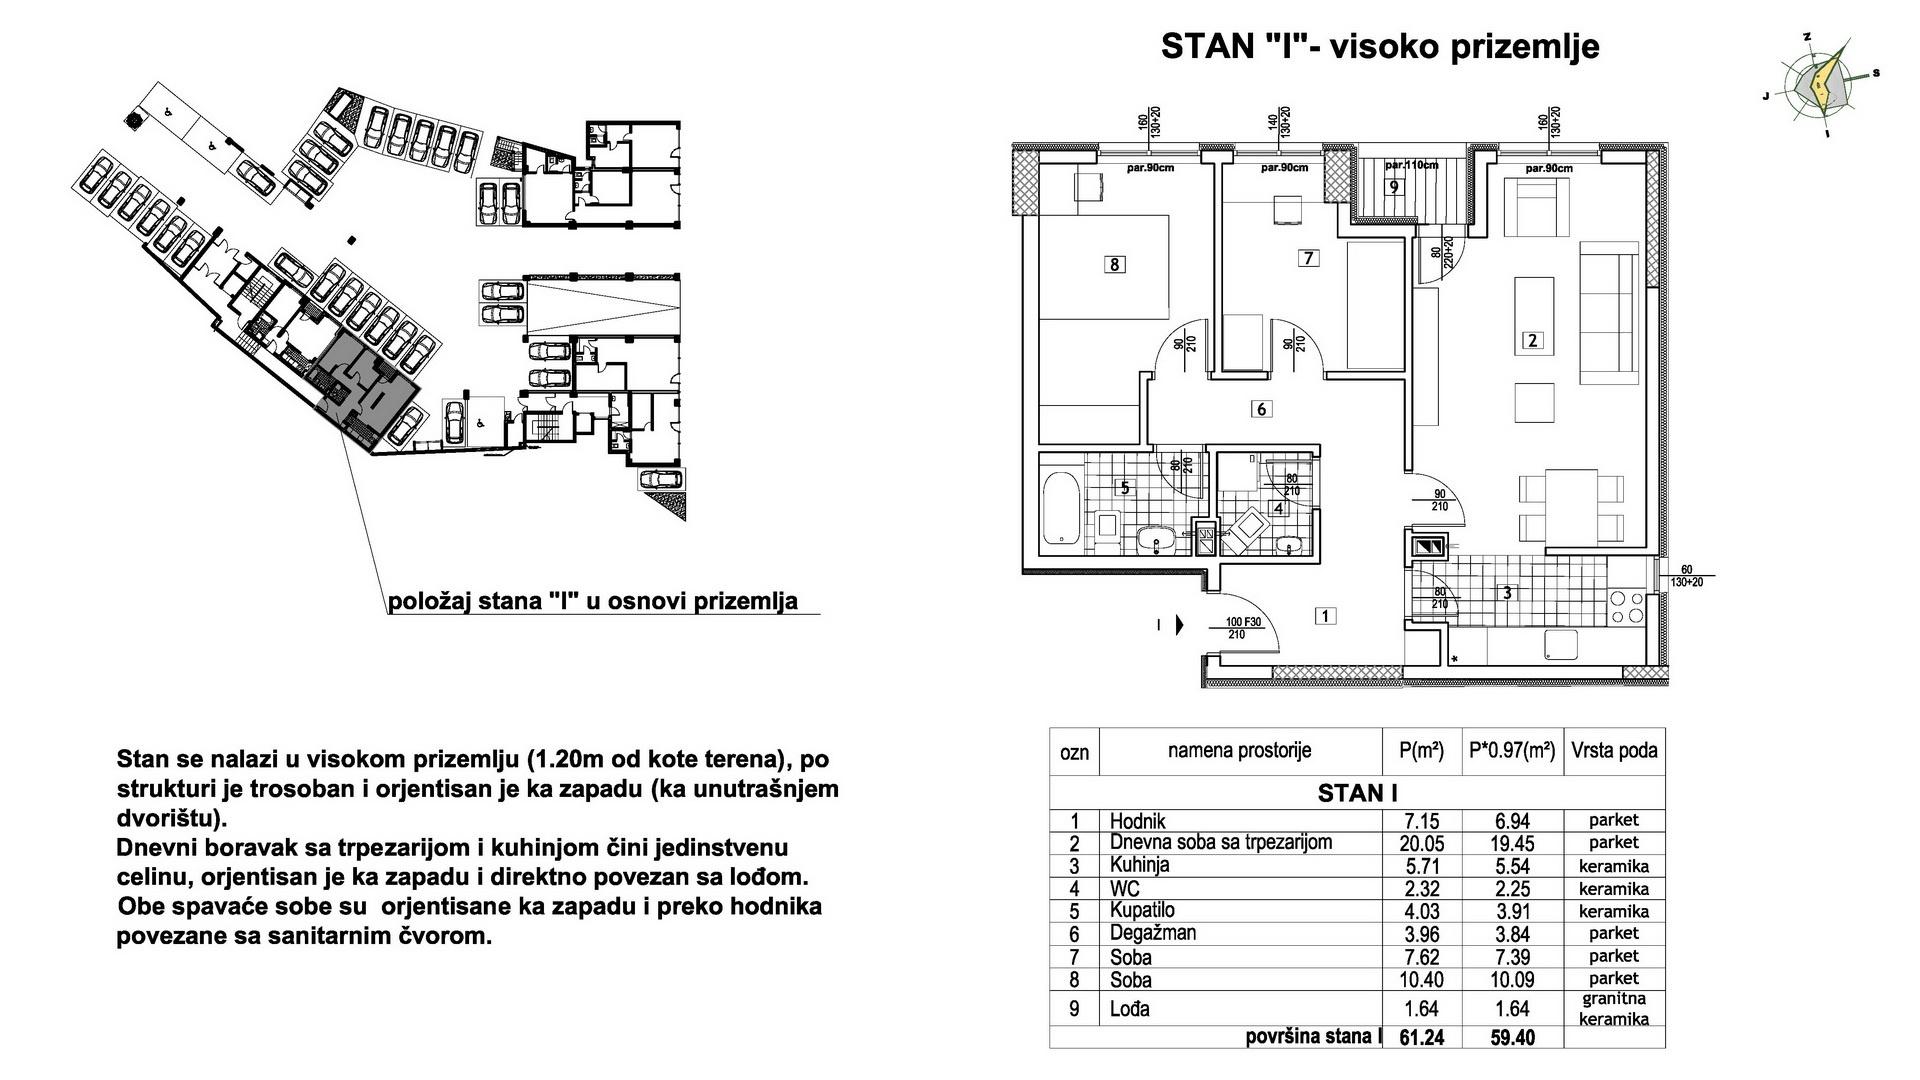 Objekat u Prešernovoj bb - Stan I